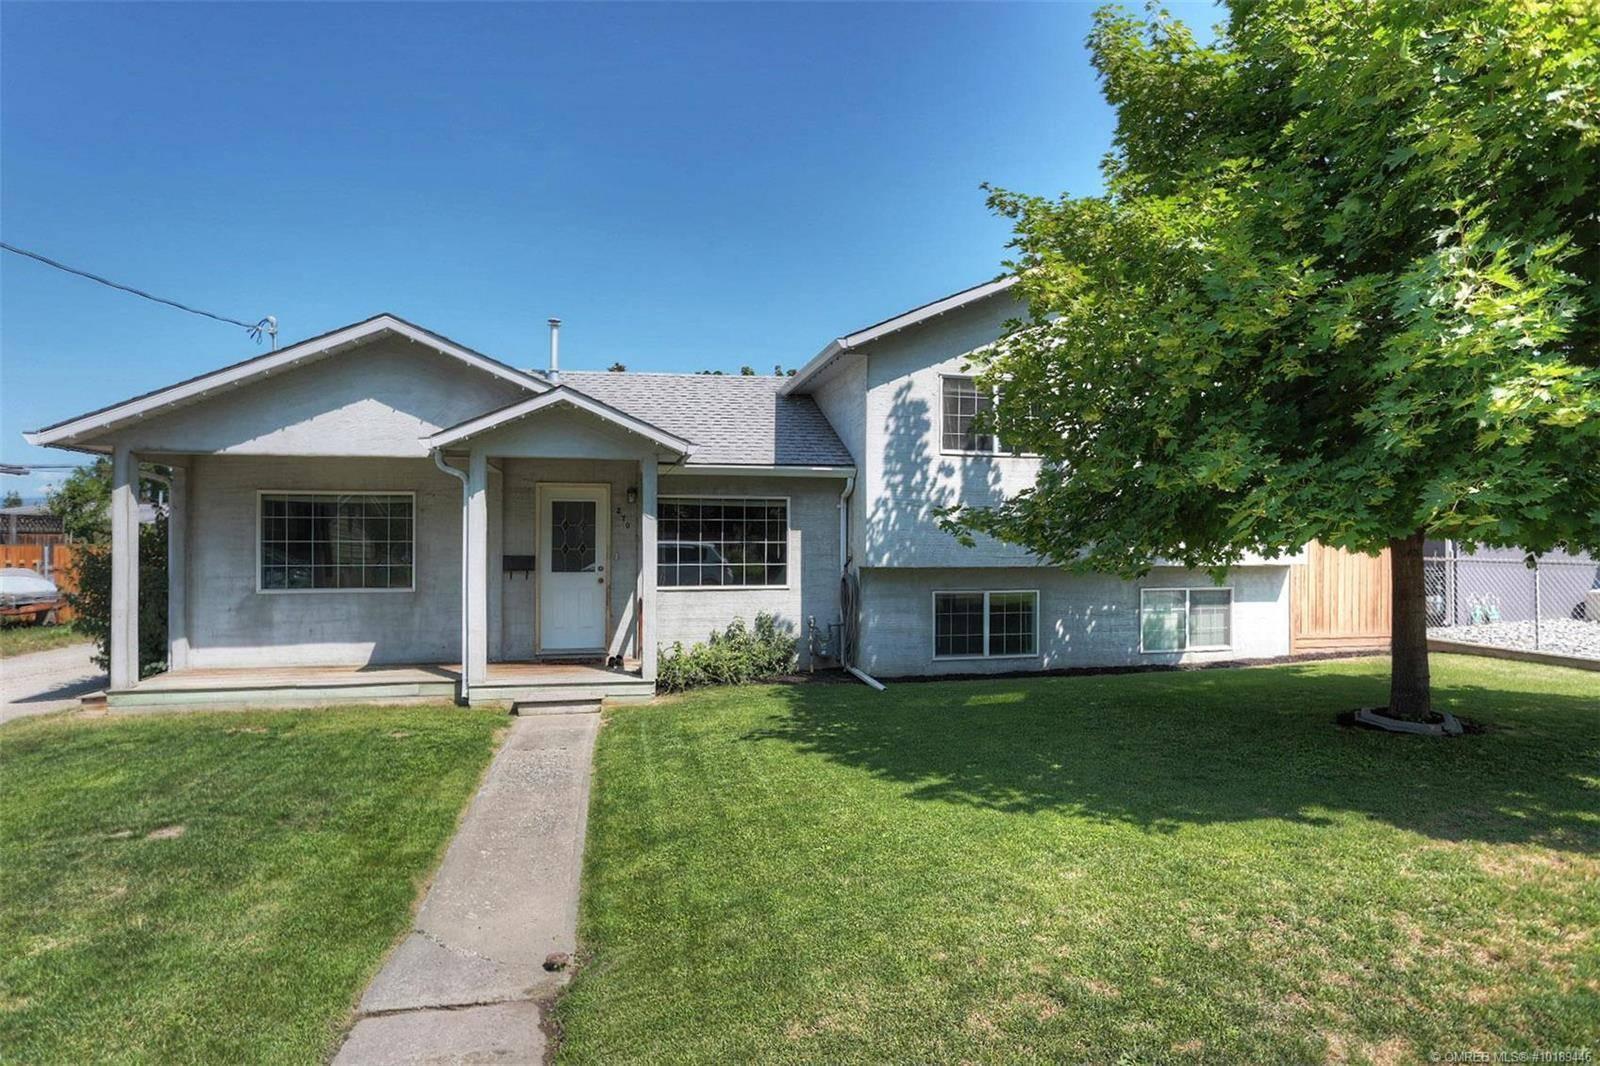 House for sale at 270 Ponto Rd Kelowna British Columbia - MLS: 10189446